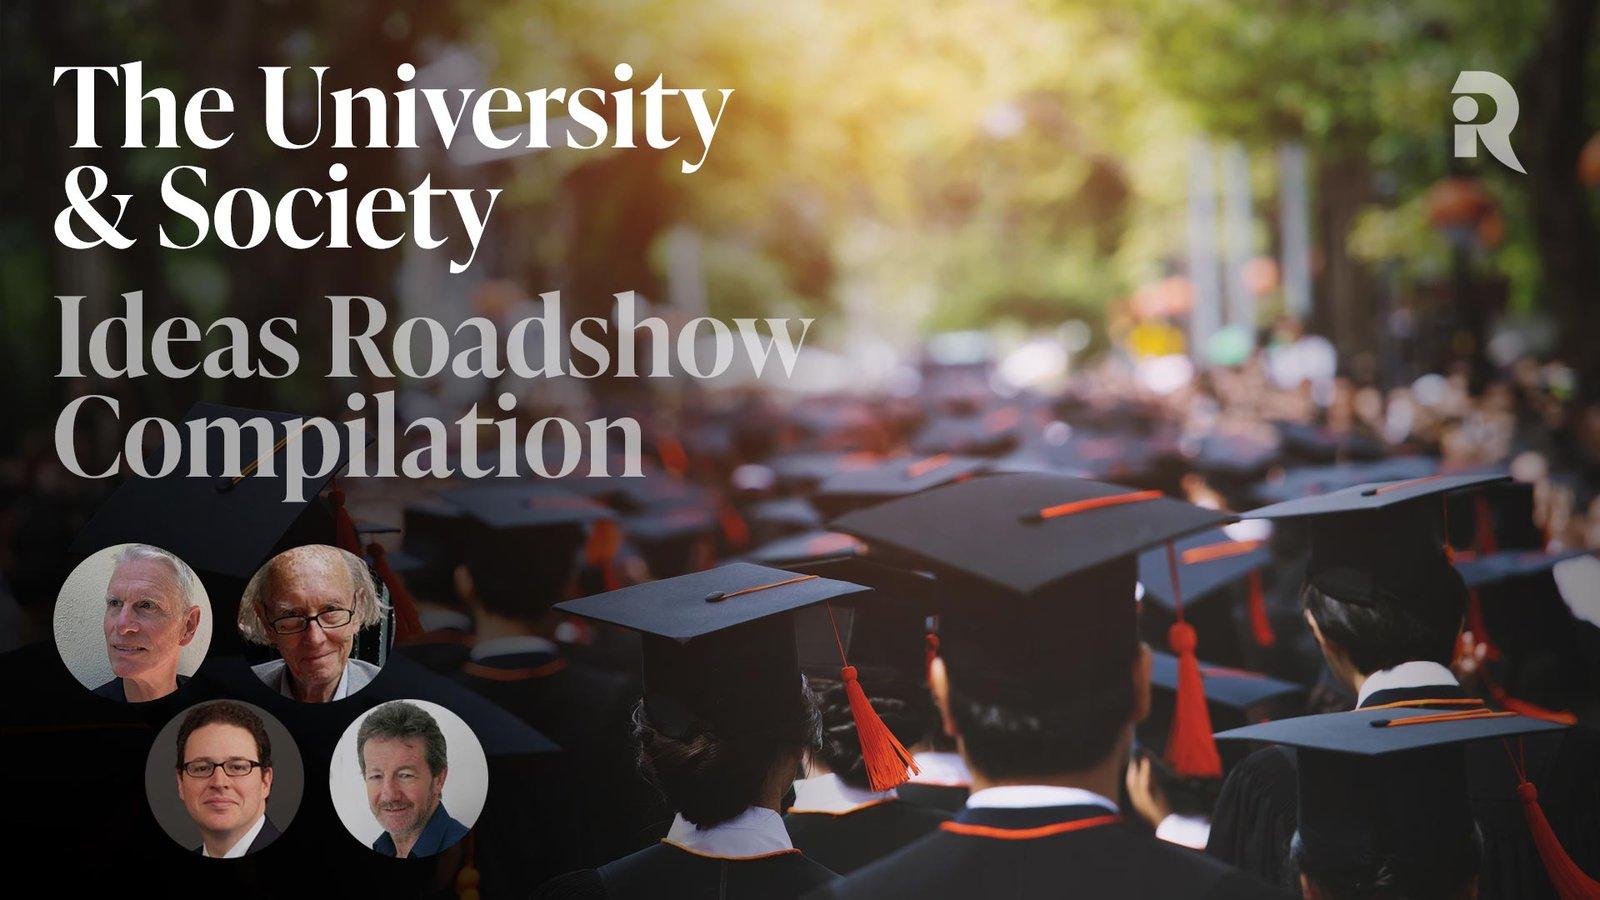 The University and Society